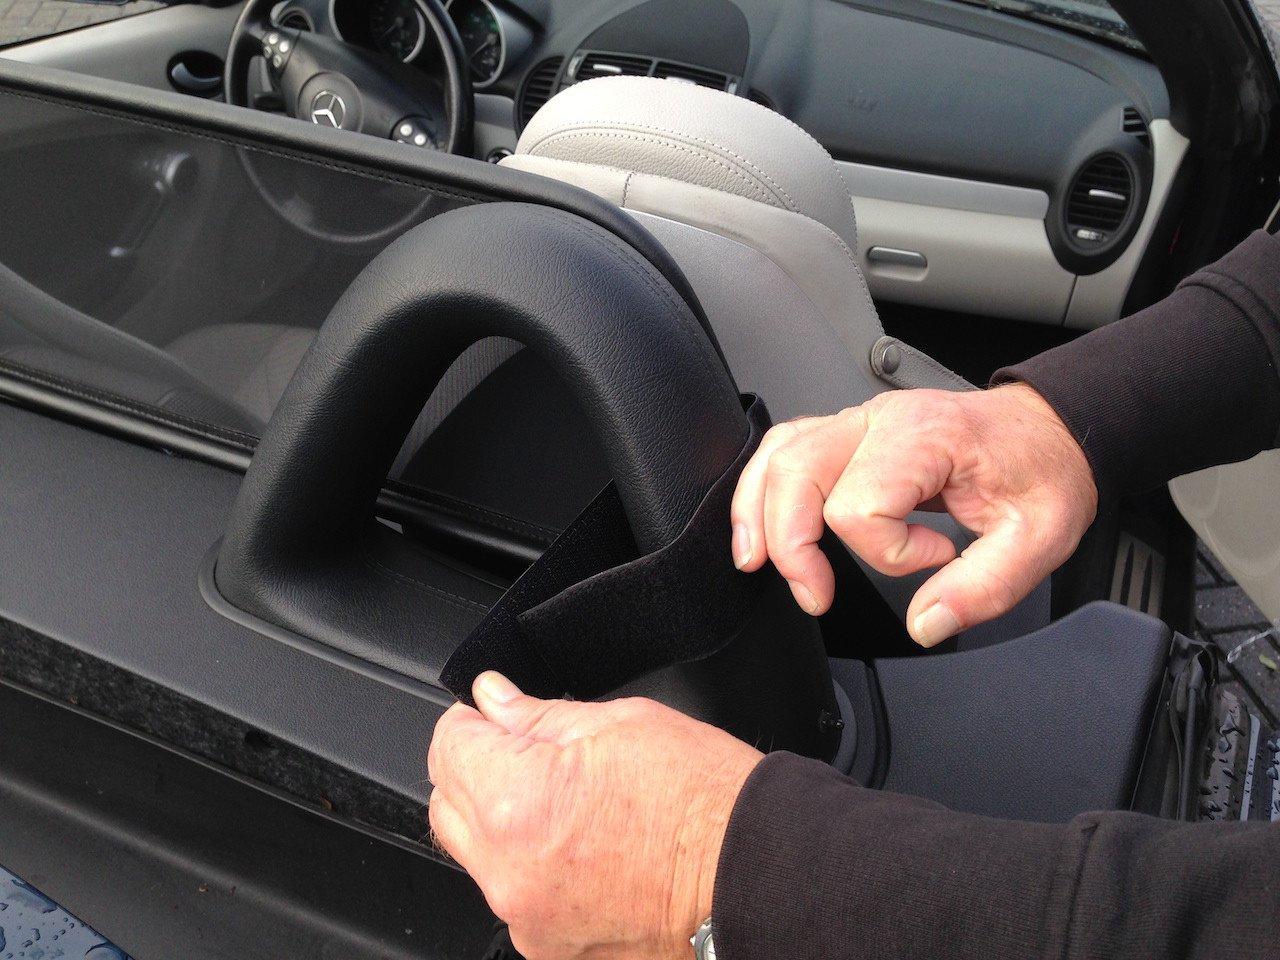 Tailor made windblocker Aperta Black wind deflector compatible with Mercedes-Benz SLK R170 Windstopper Mercedes-Benz convertible Draft-stop